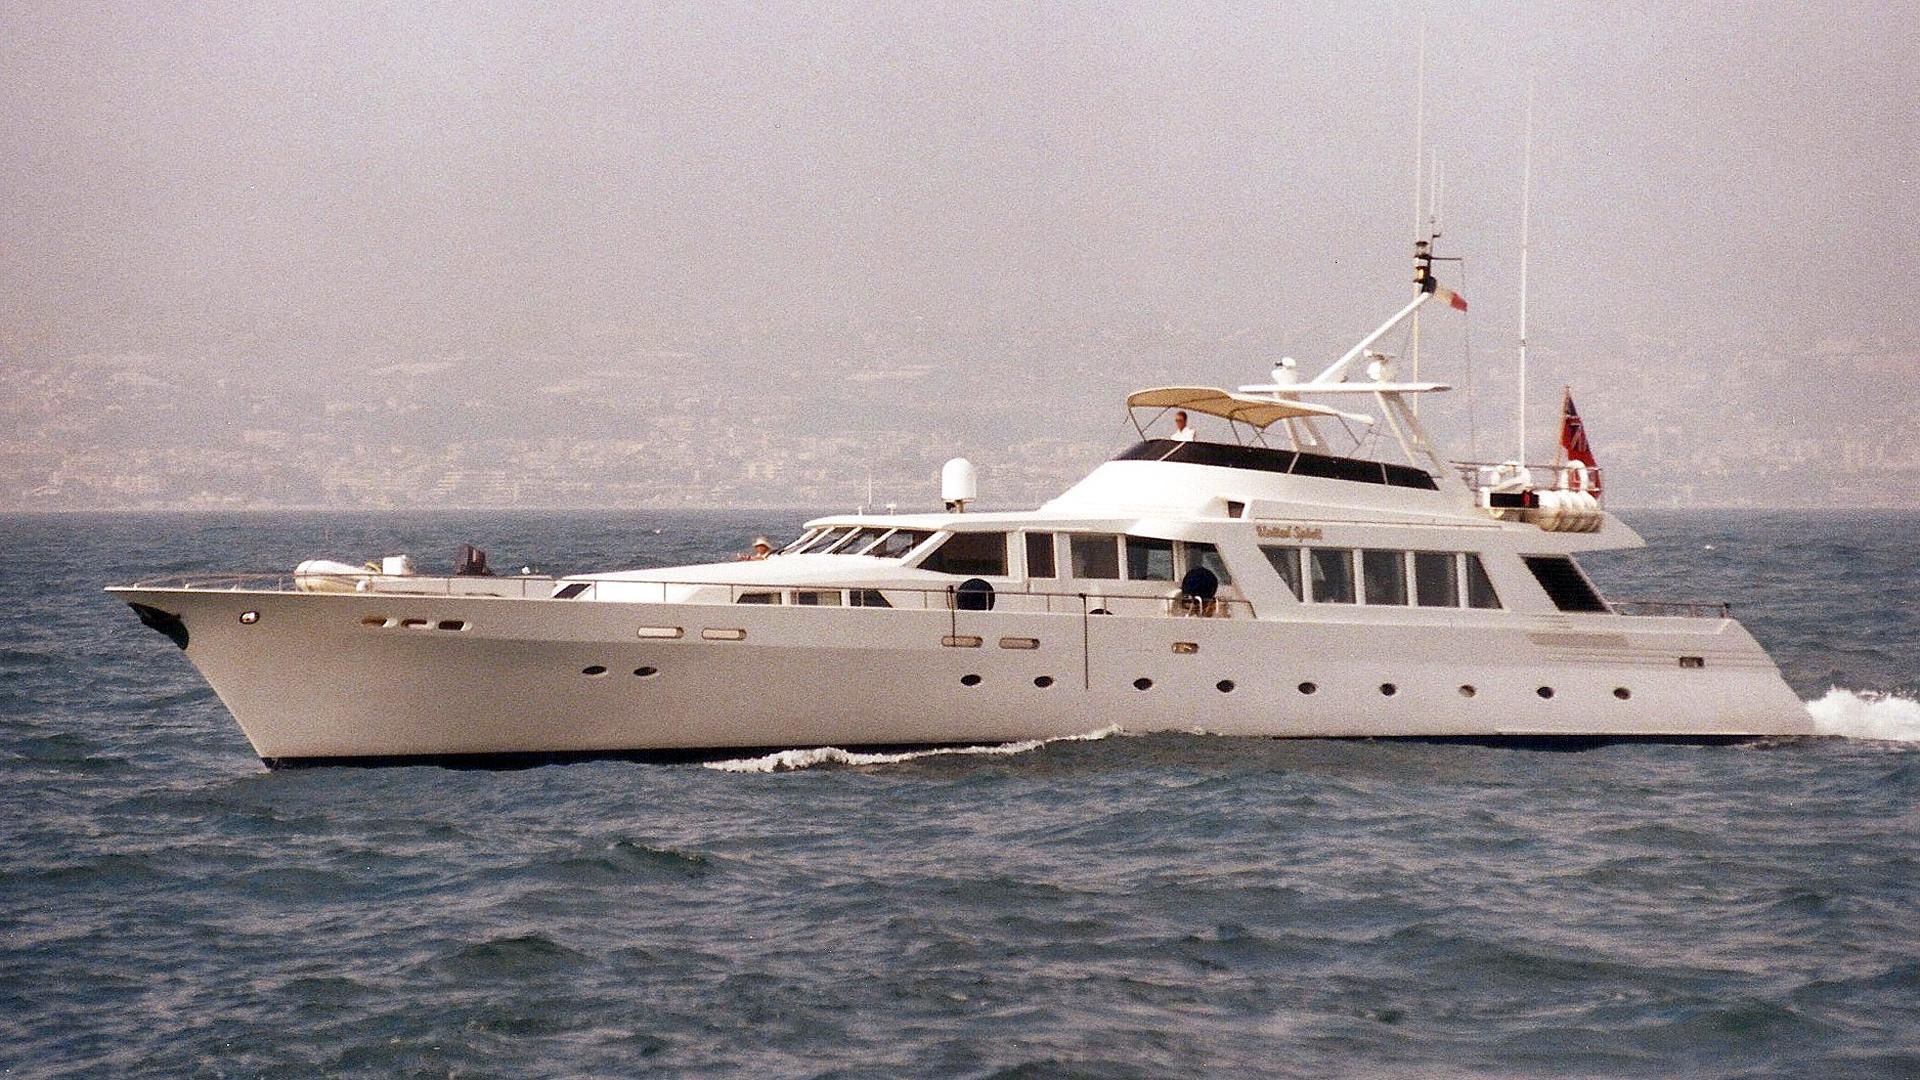 united-spirit-motor-yacht-gotaverken-1938-34m-profile